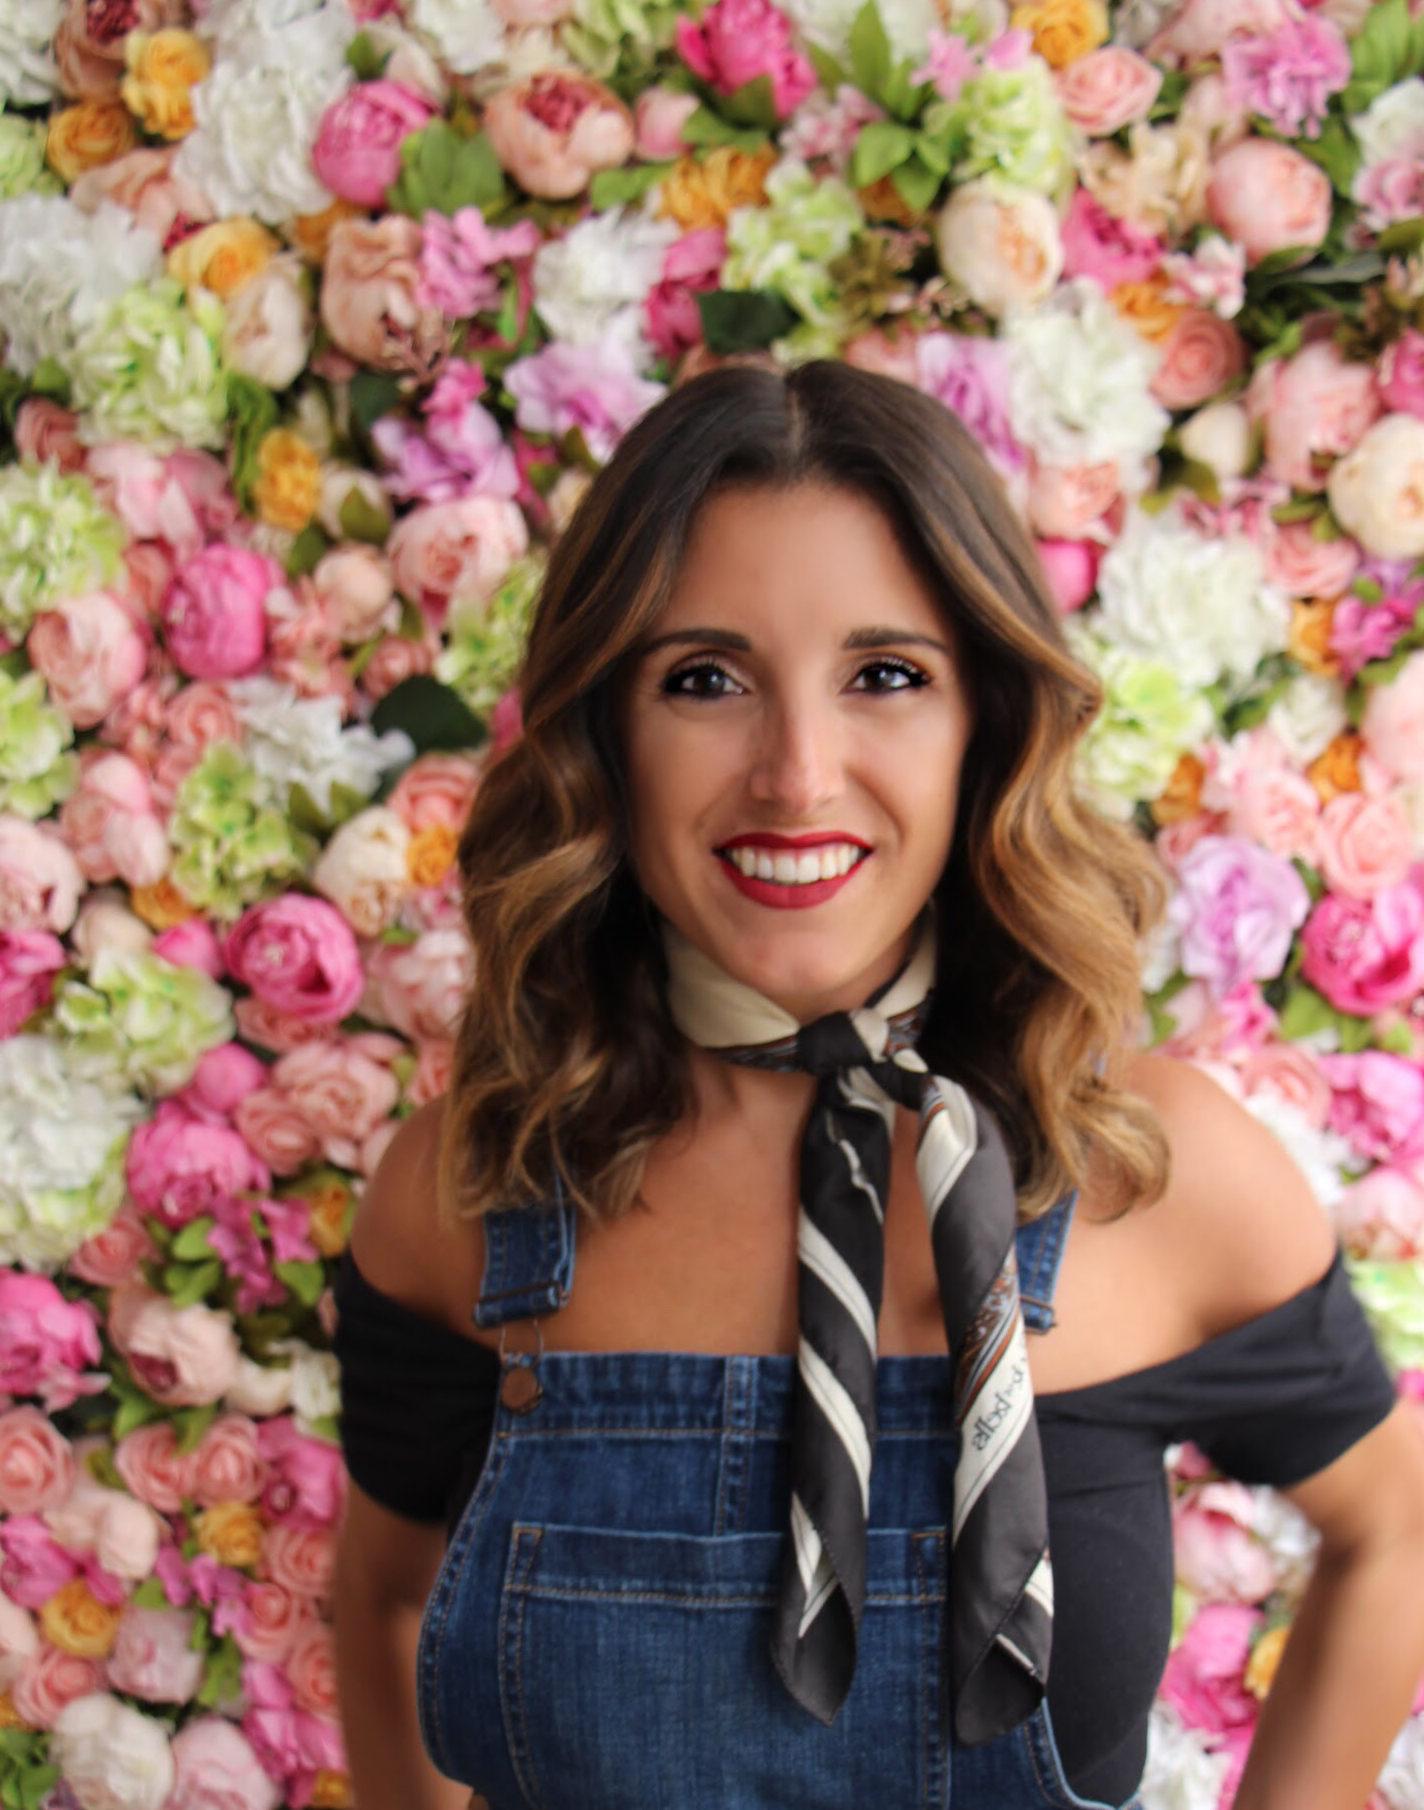 Amy Rose Sin Ropa meet team winky lux: jenna romero, social media manager